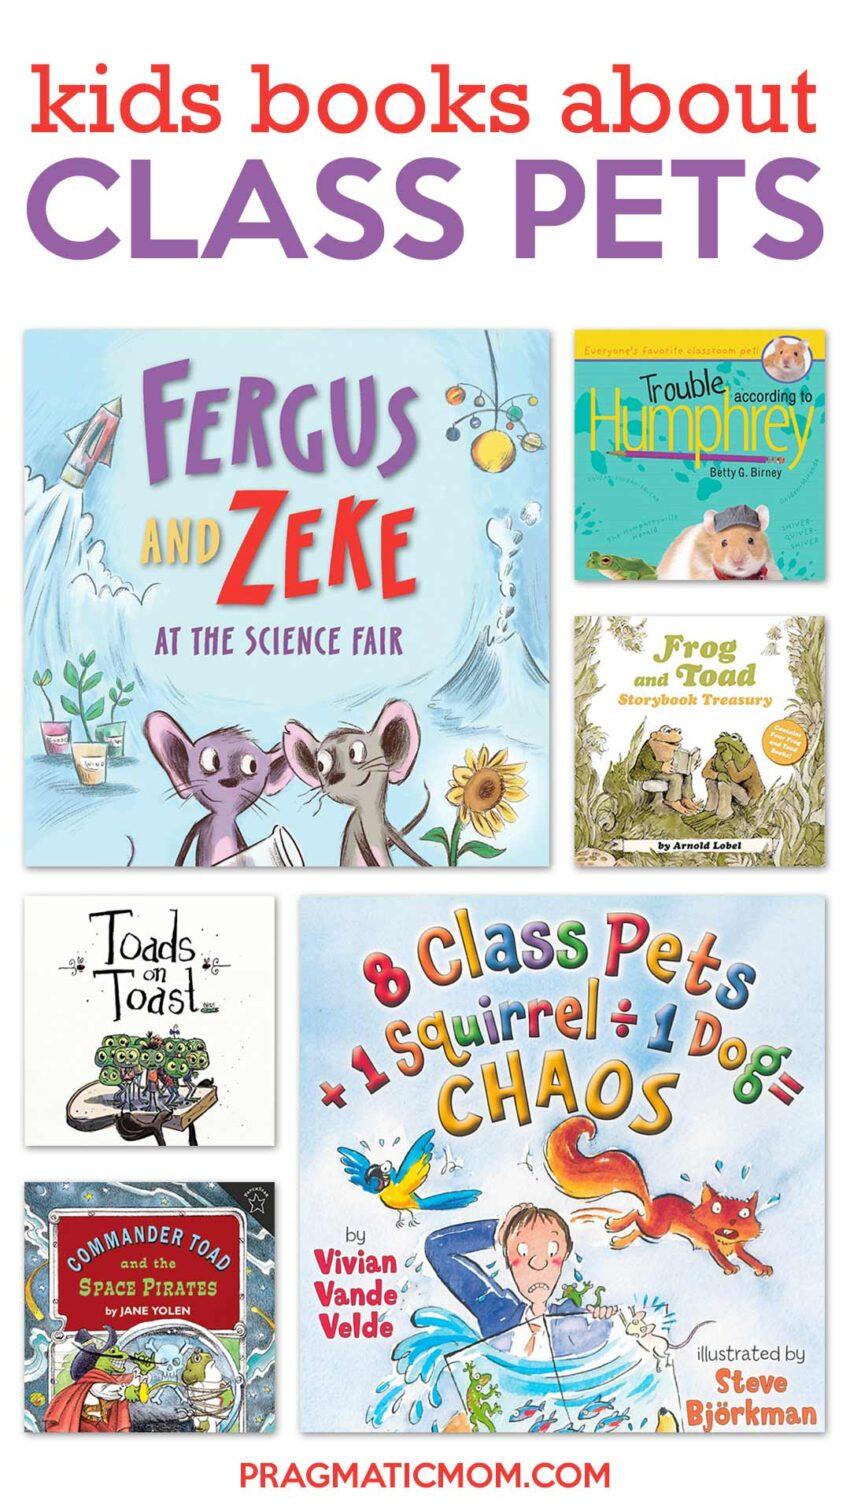 Children's Books about Class Pets